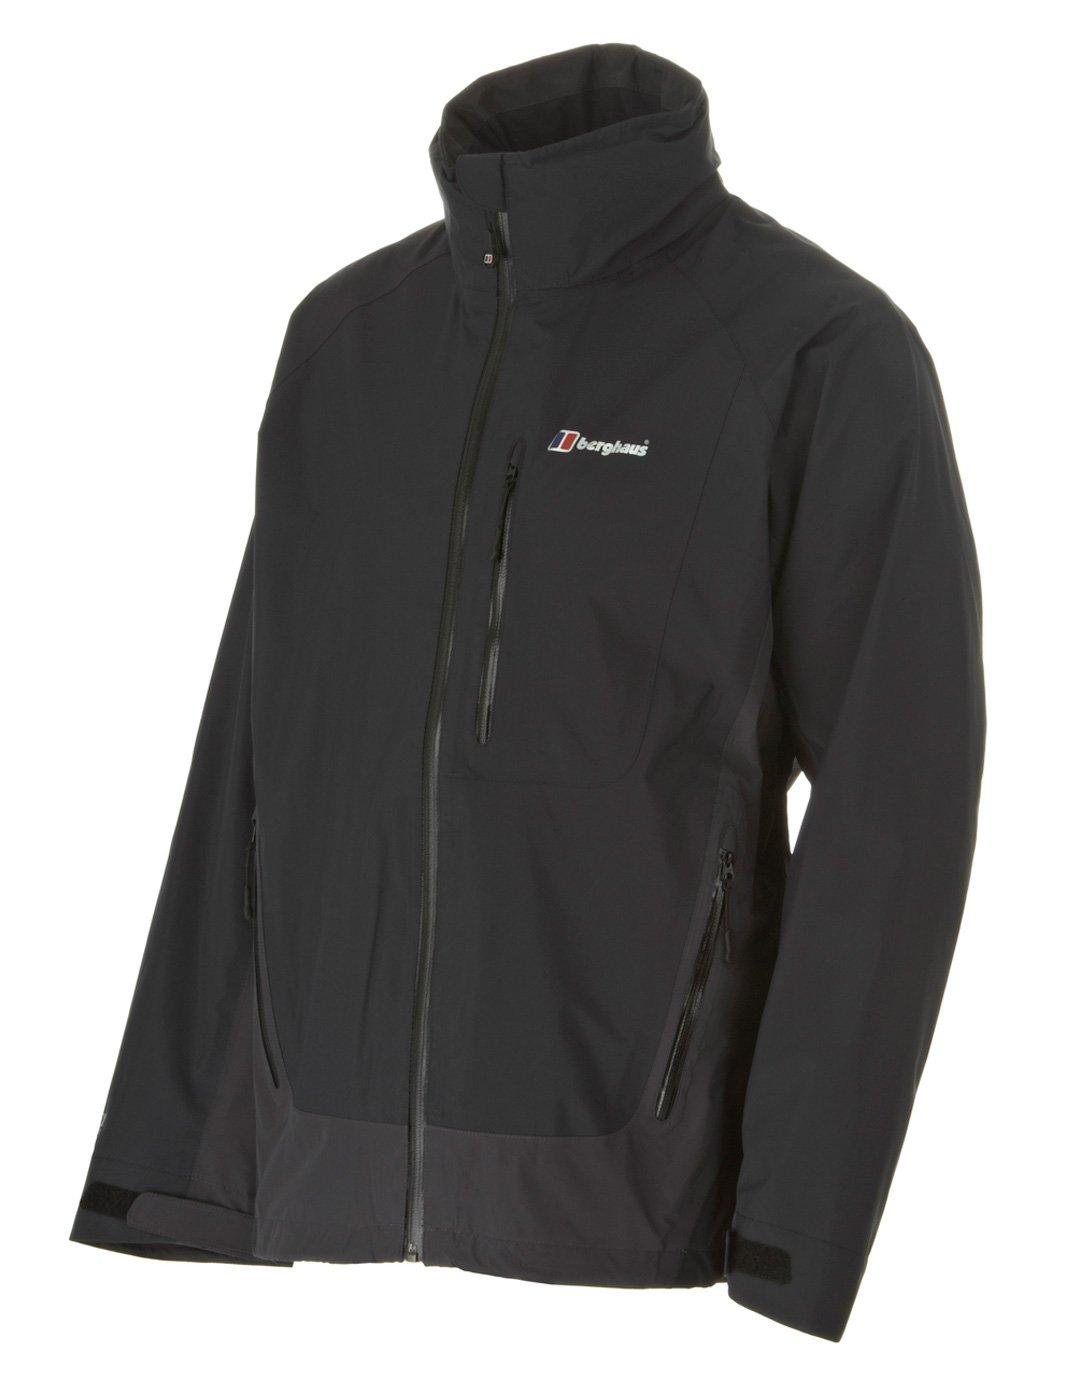 berghaus Herren Snowboard Jacke Carrock Shell Jacket